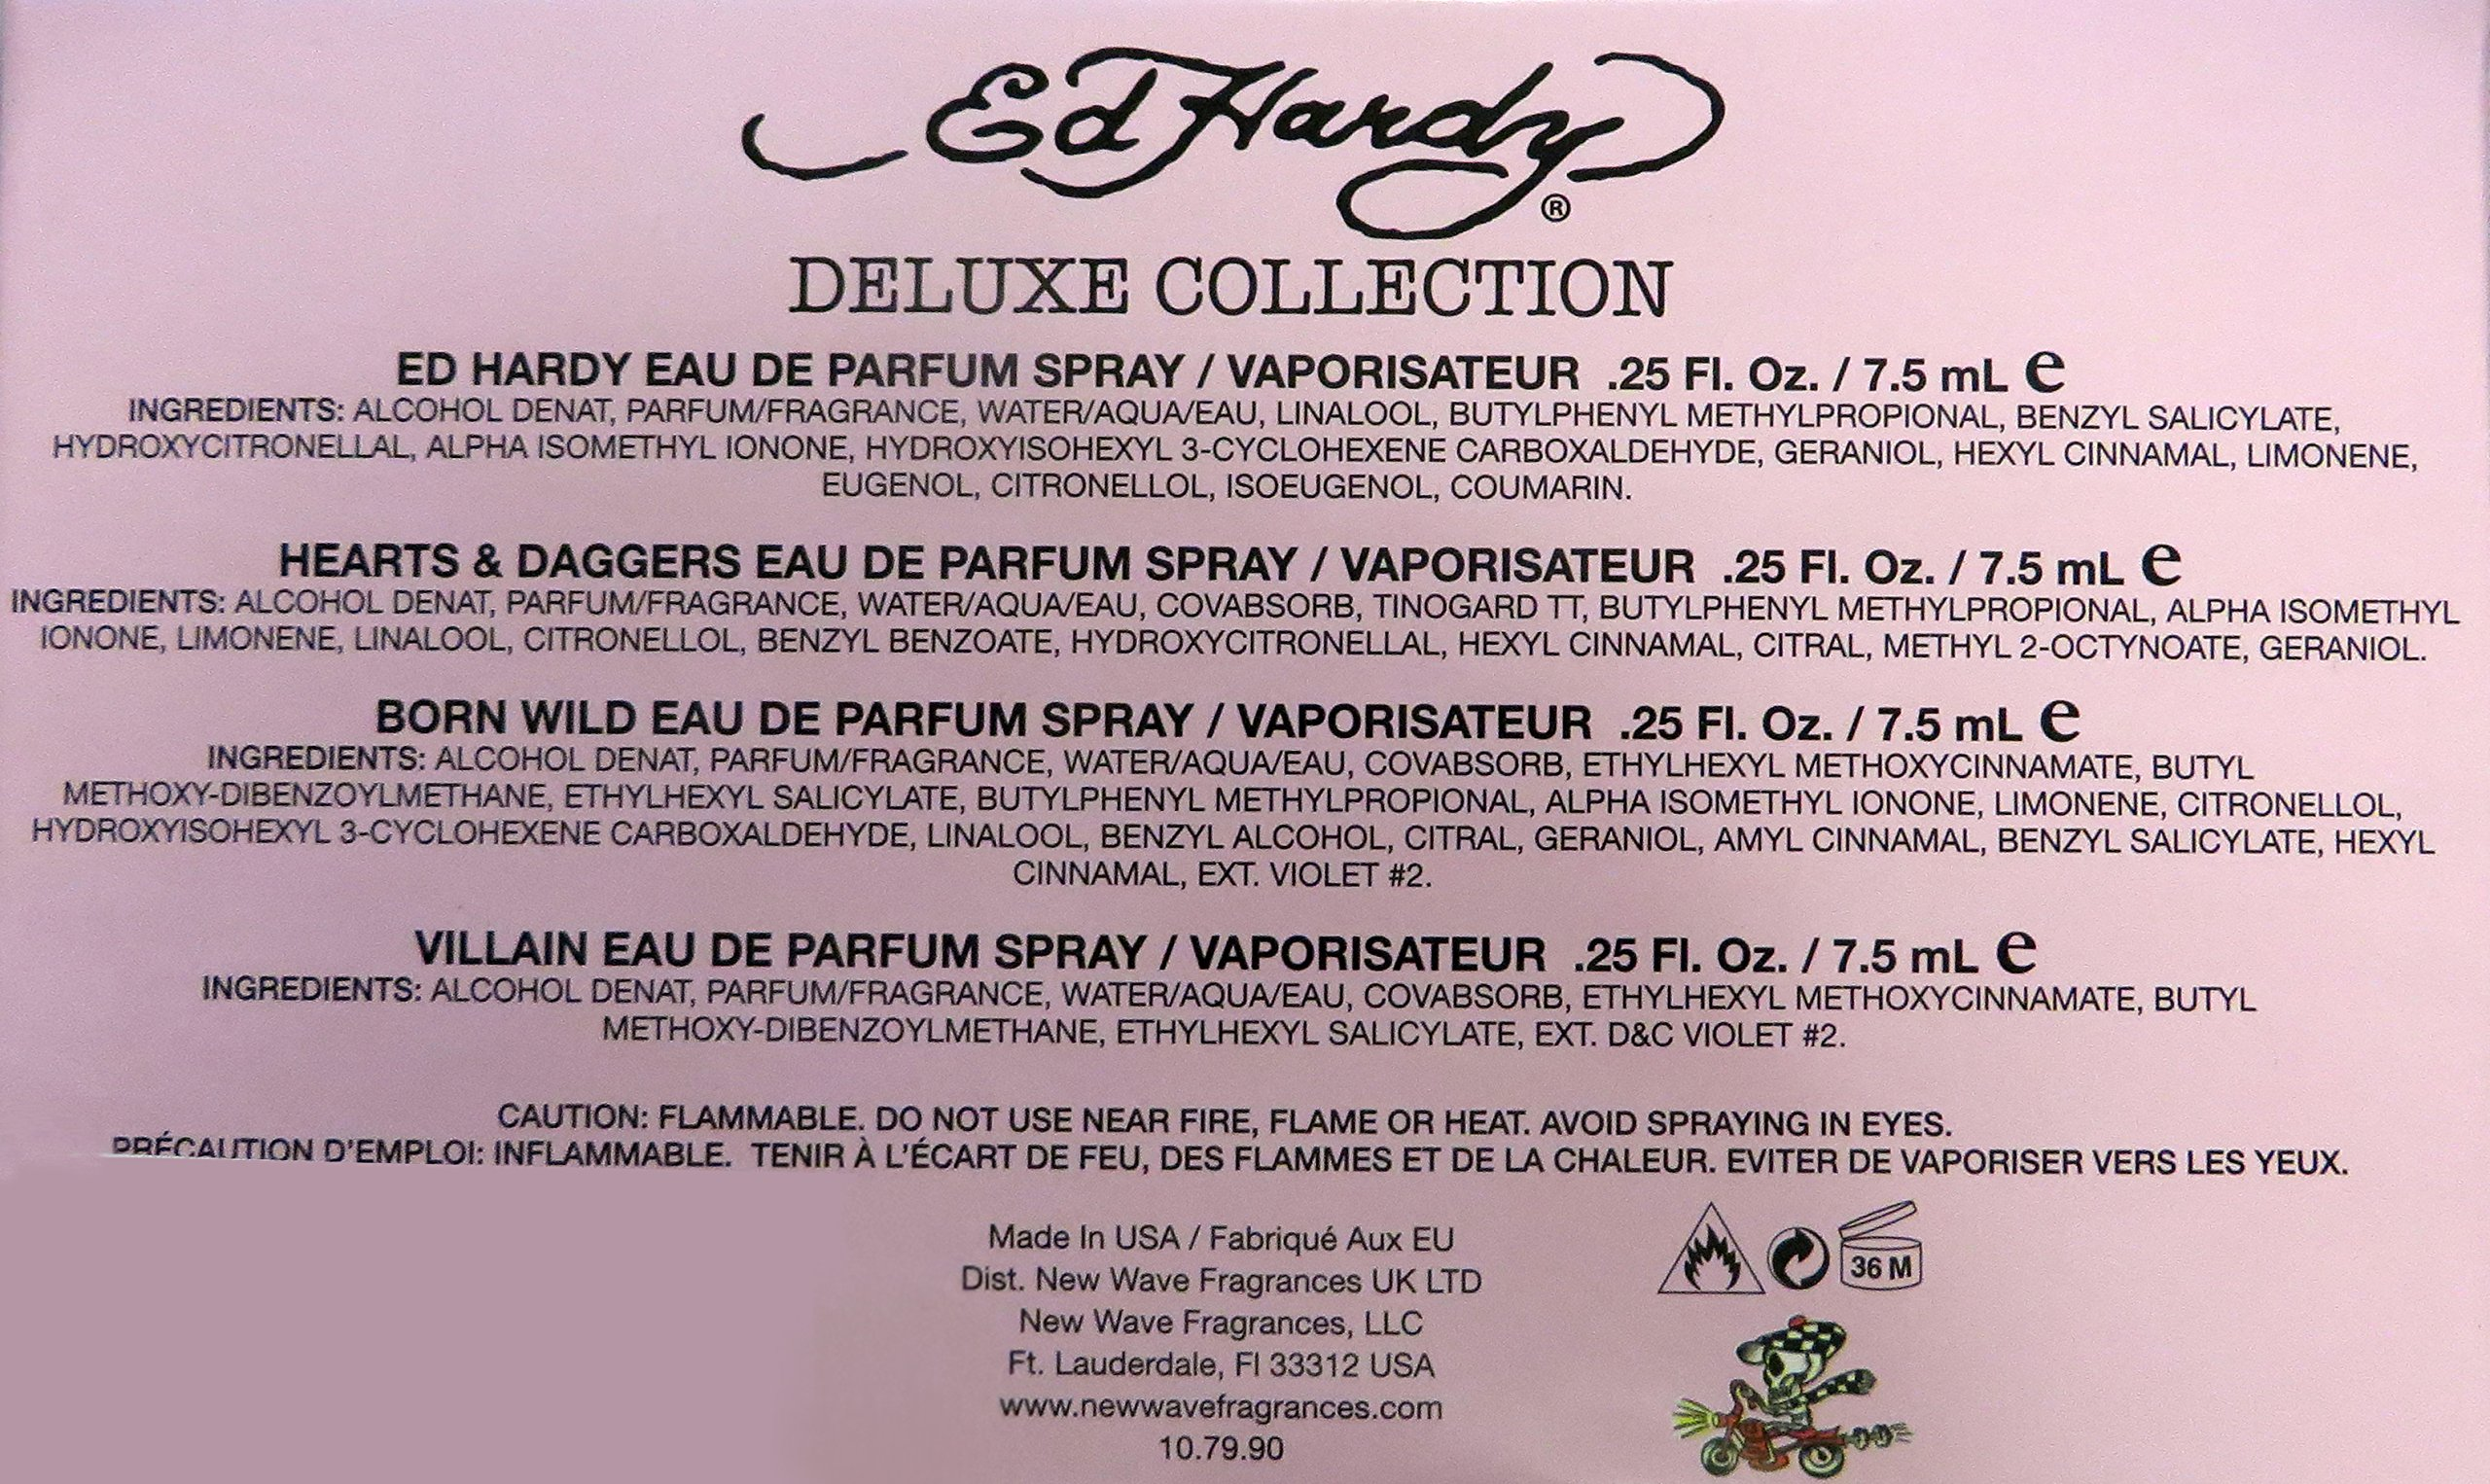 Ed Hardy by Christian Audigier Mini Variety Set for Women (Ed Hardy Classic, Hearts & Daggers, Skulls & Roses, Villain)